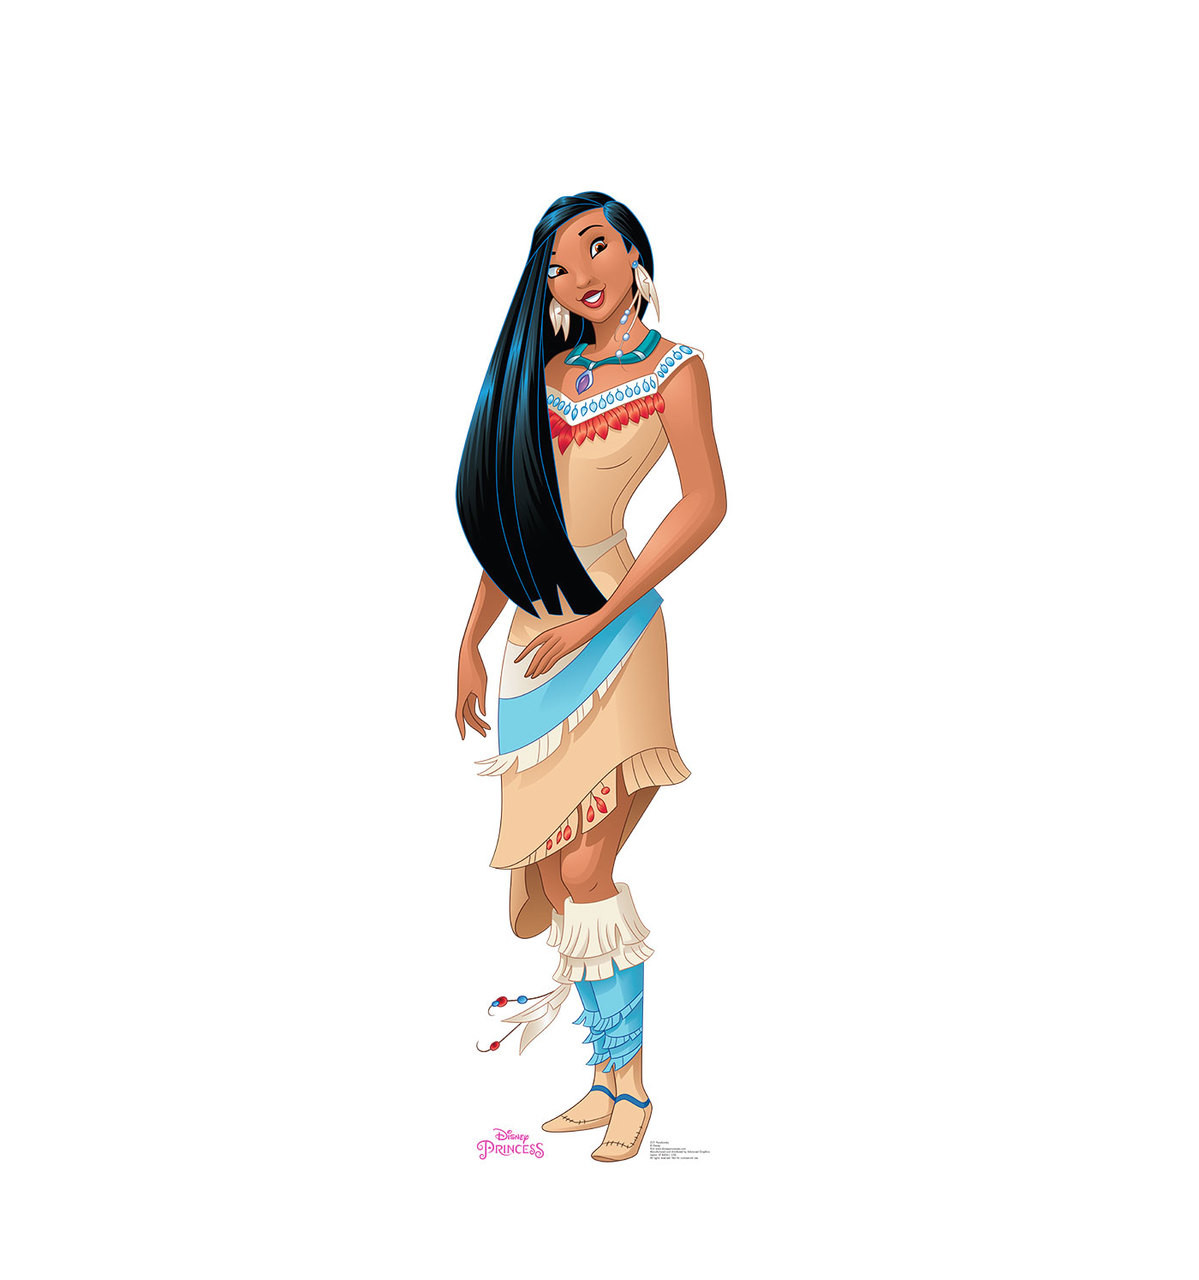 Life-size Pocahontas - Friendship Adventures Cardboard Standup | Cardboard Cutout